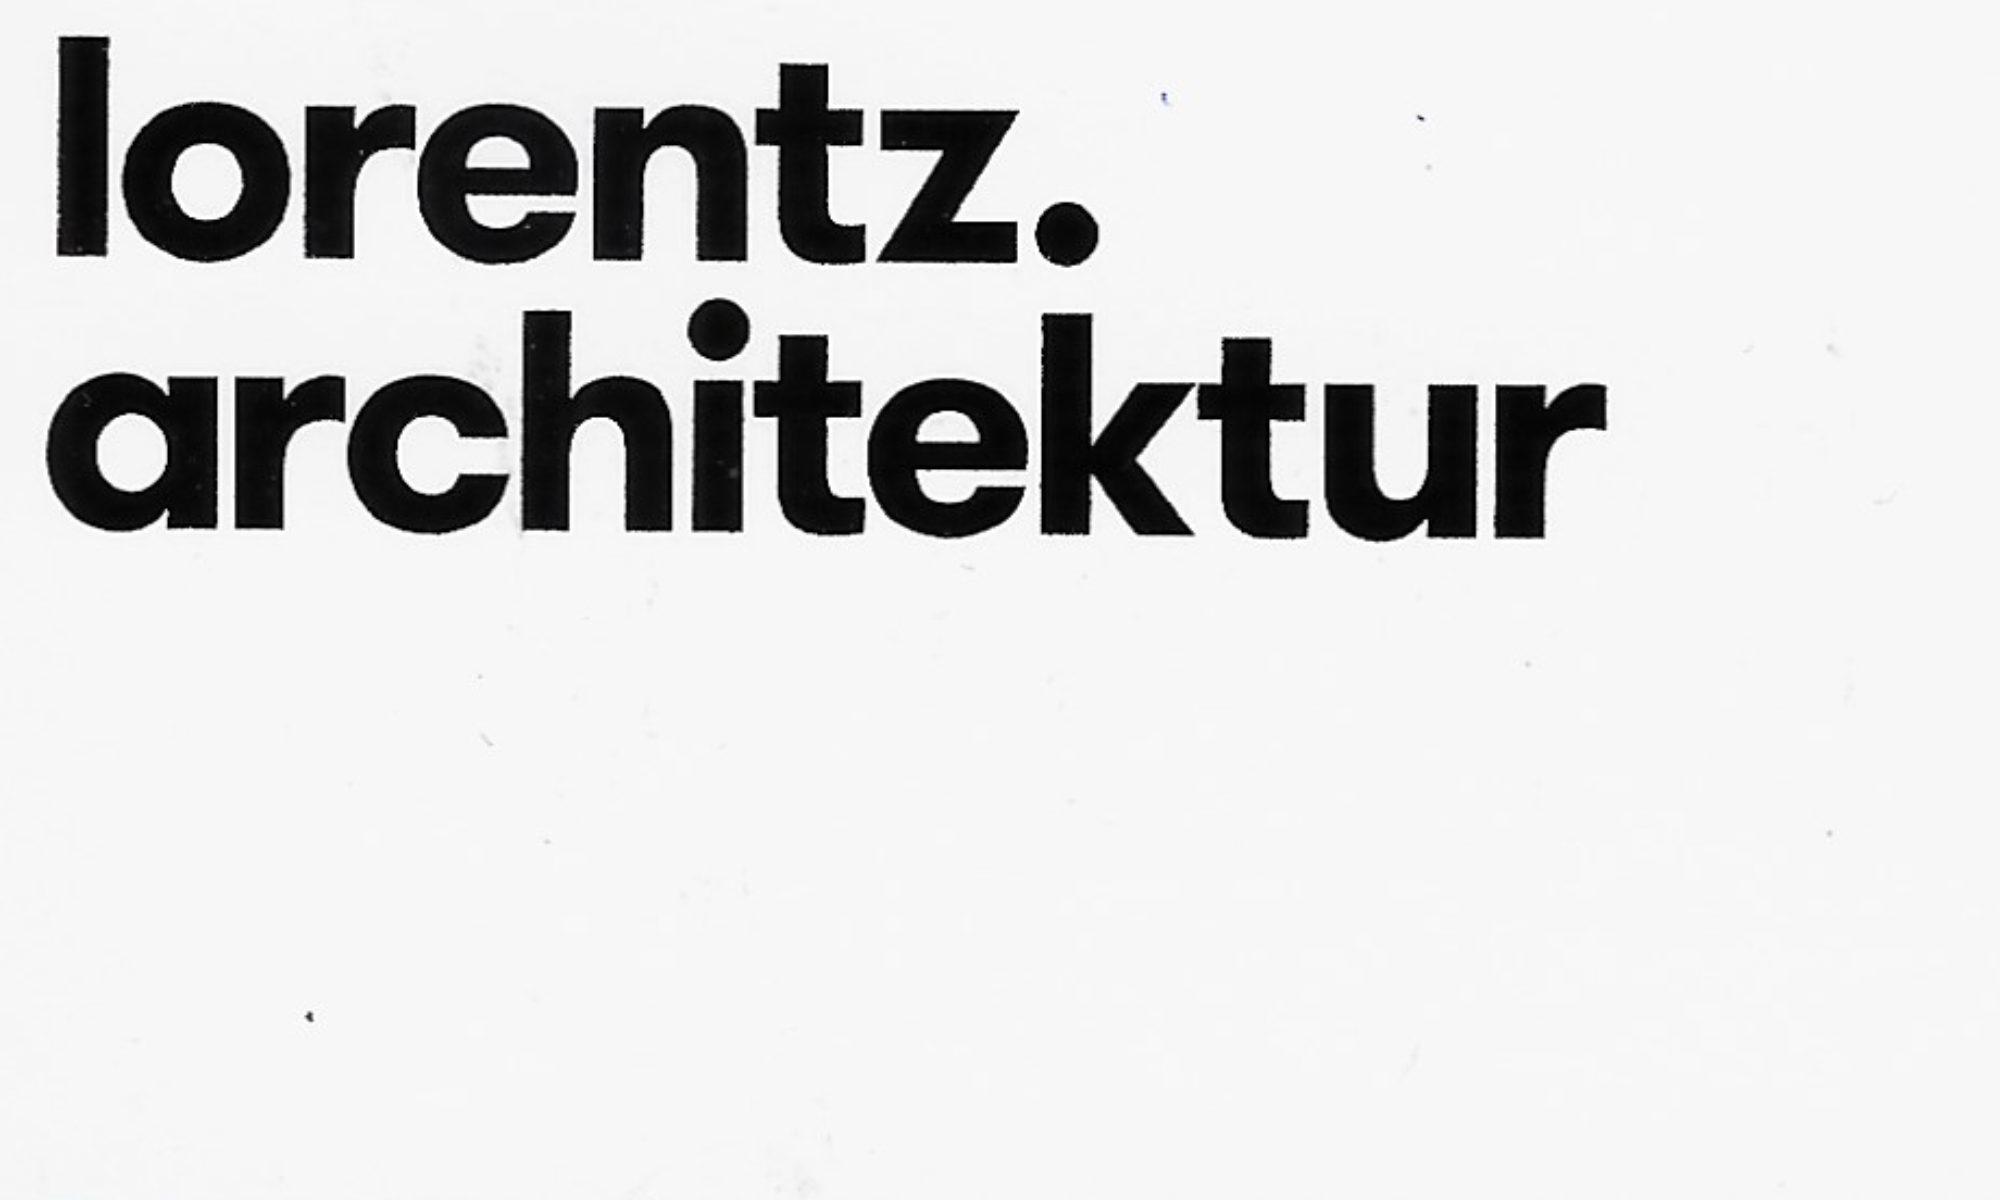 lorentz.architektur